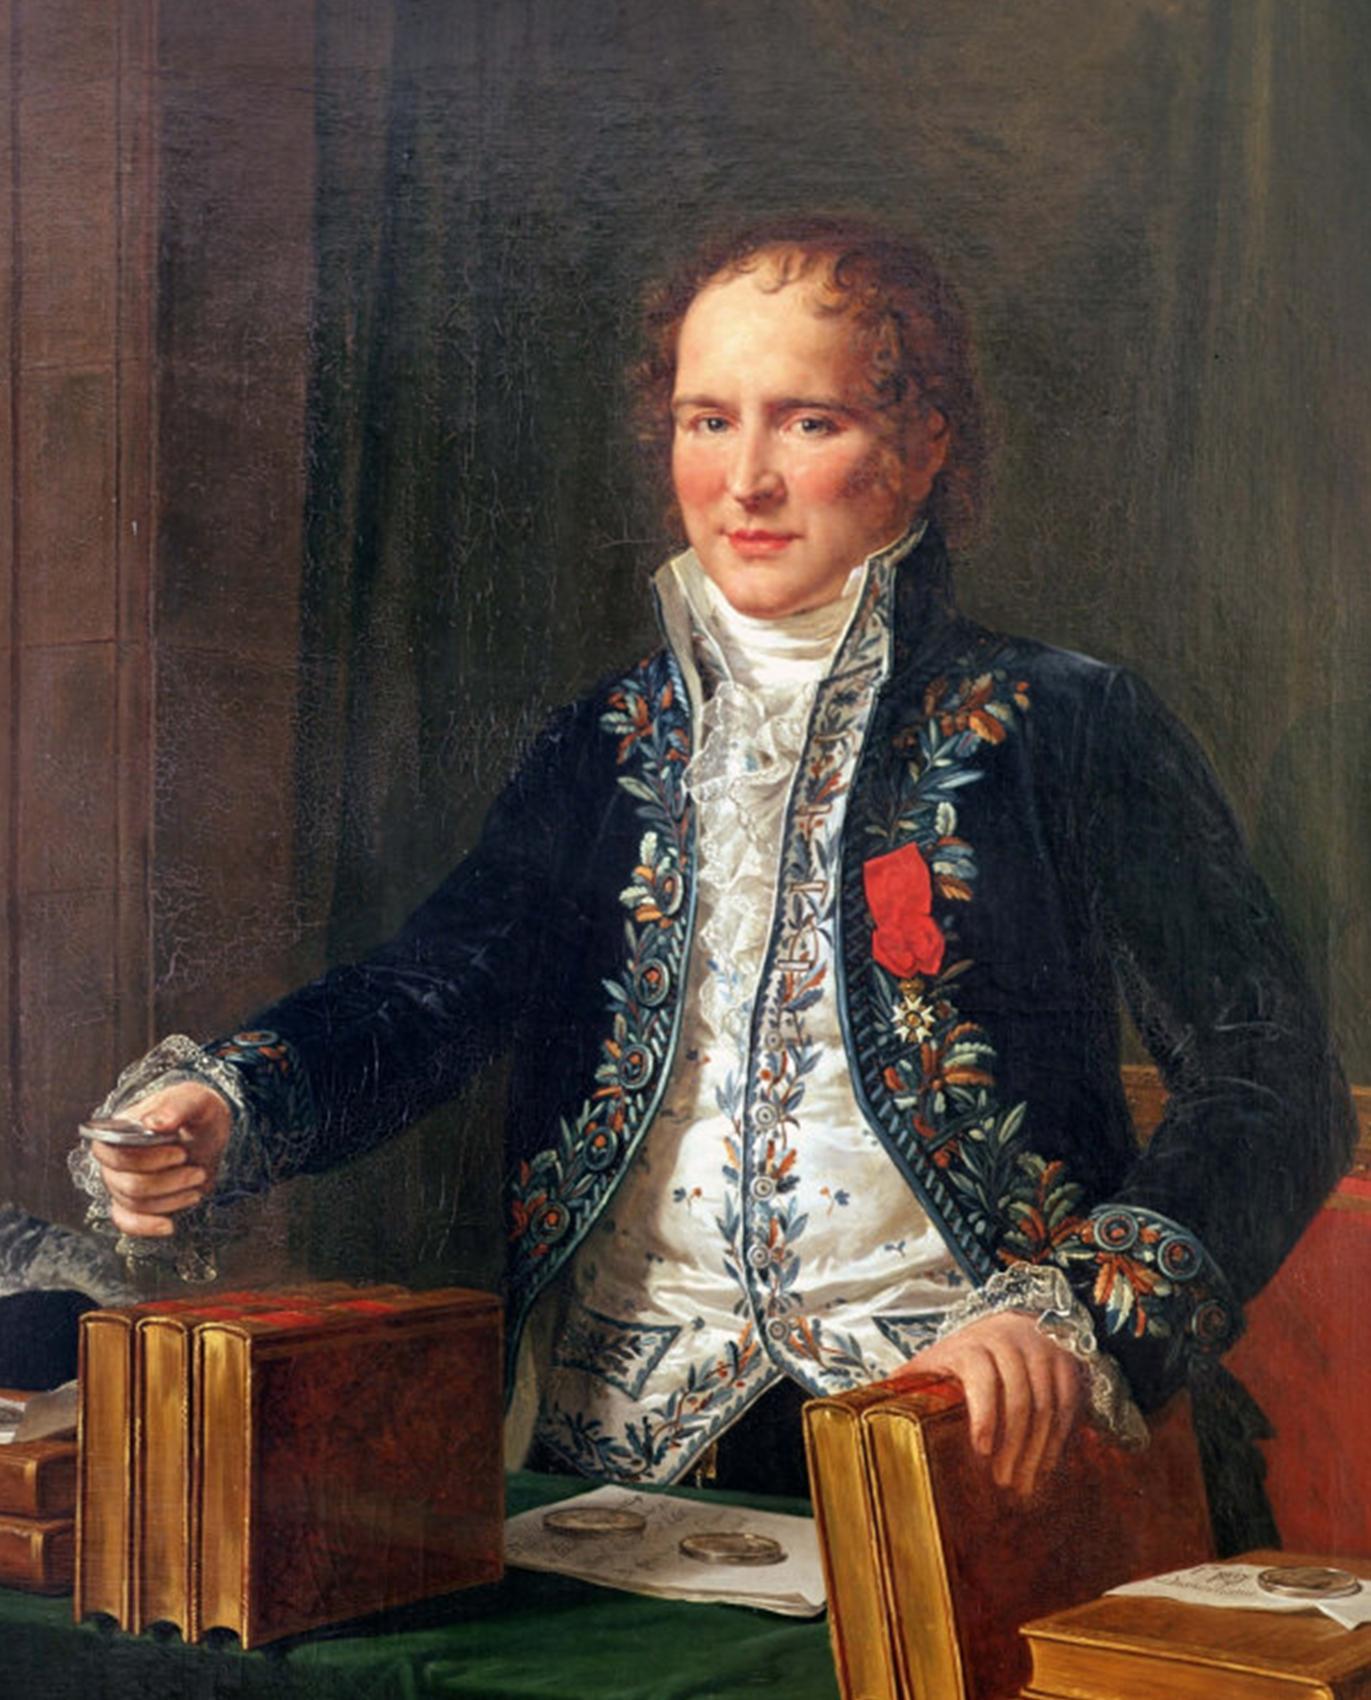 https://upload.wikimedia.org/wikipedia/commons/e/ed/Lemonnier_-_Antoine-Fran%C3%A7ois_de_Fourcroy.jpg